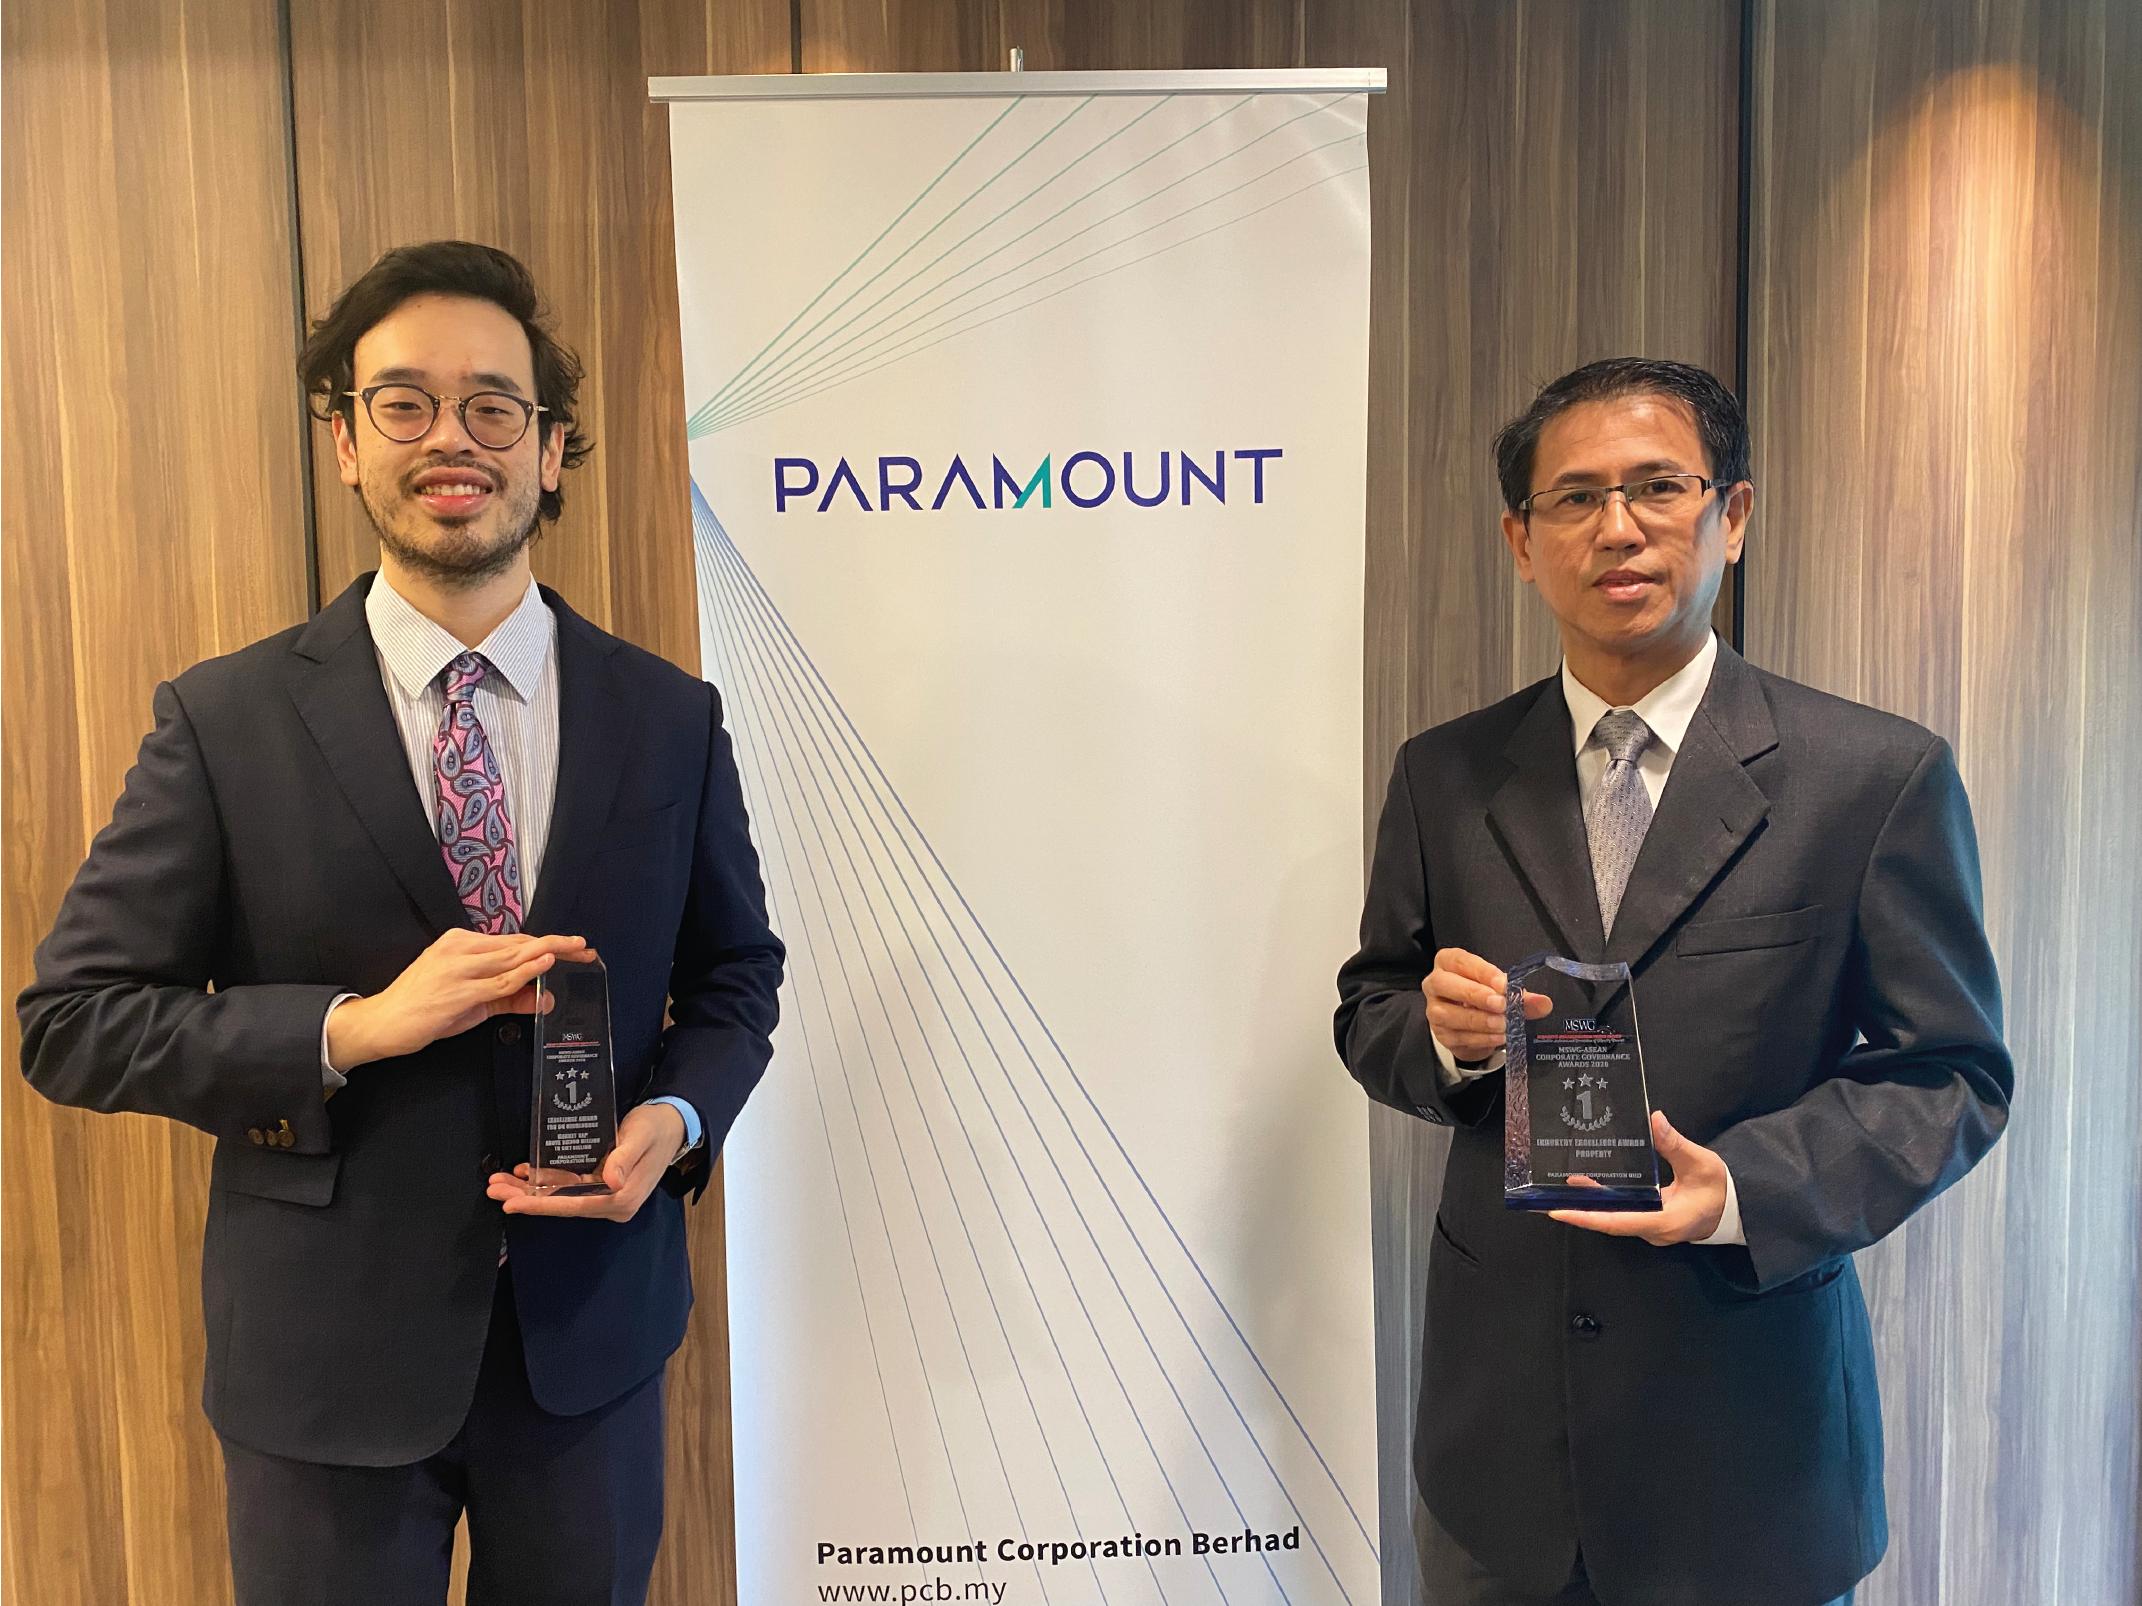 MSWG Awards Jeffrey Chew and Benjamin Teo